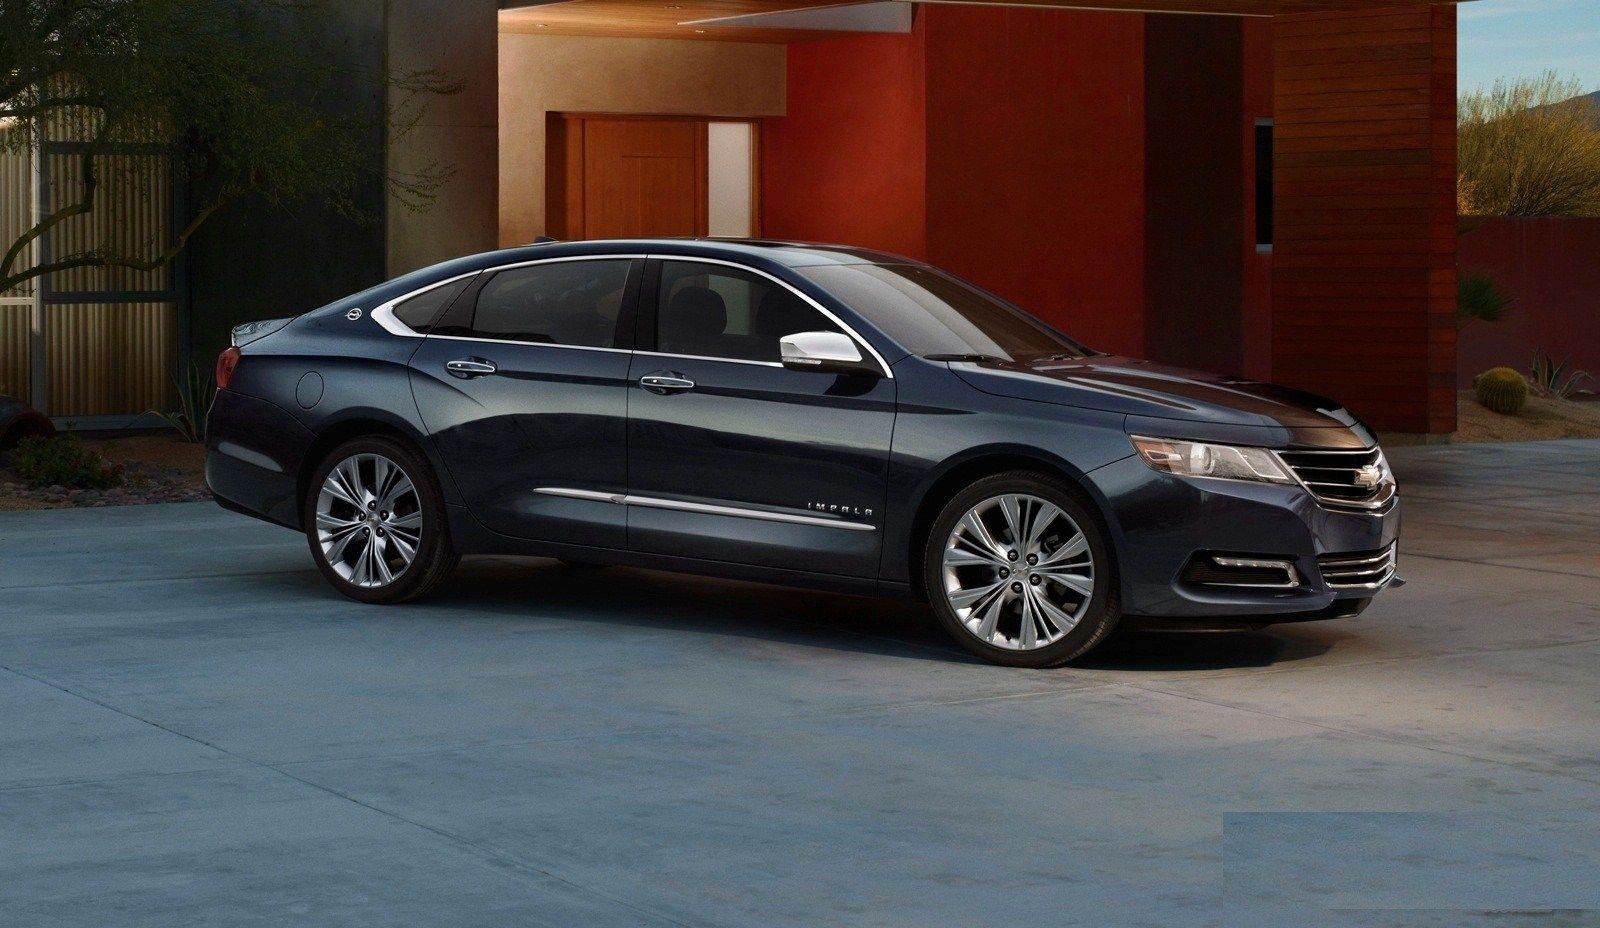 images of 2015 impala chevrolet 2013 chevy impala [ 1600 x 928 Pixel ]